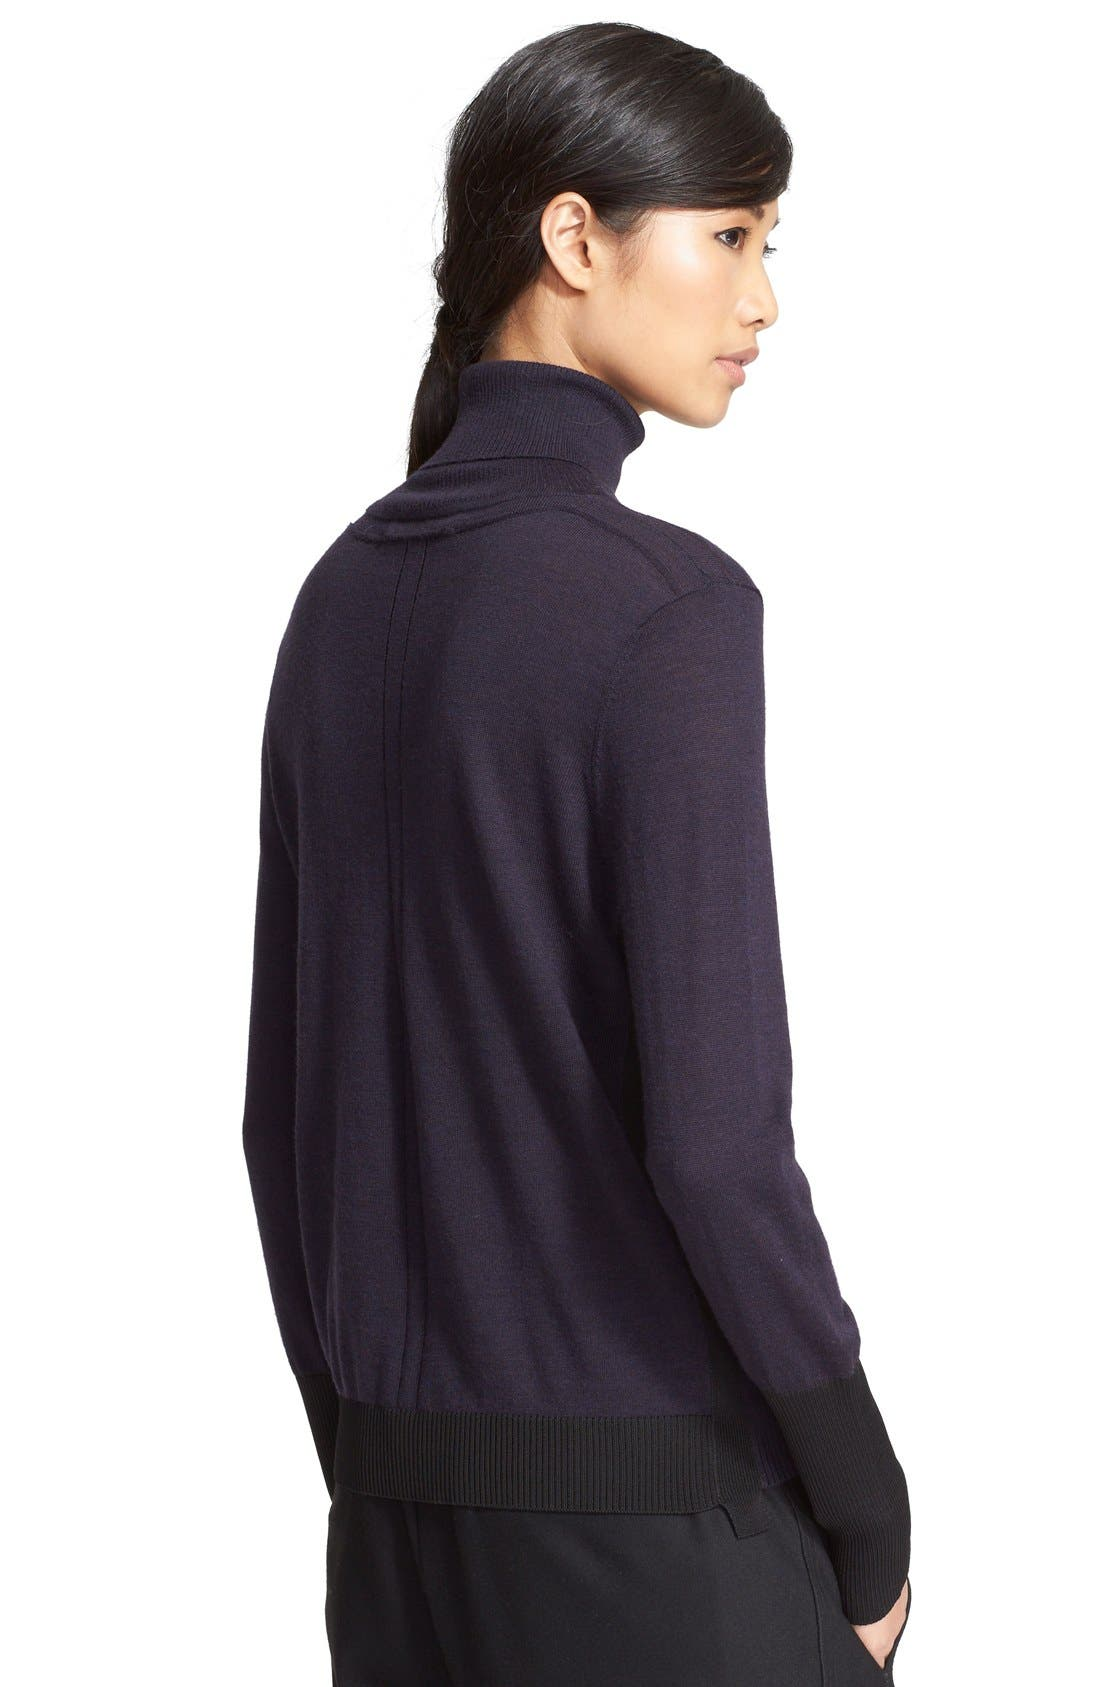 'Jessica' Wool Blend Turtleneck Sweater,                             Alternate thumbnail 4, color,                             001